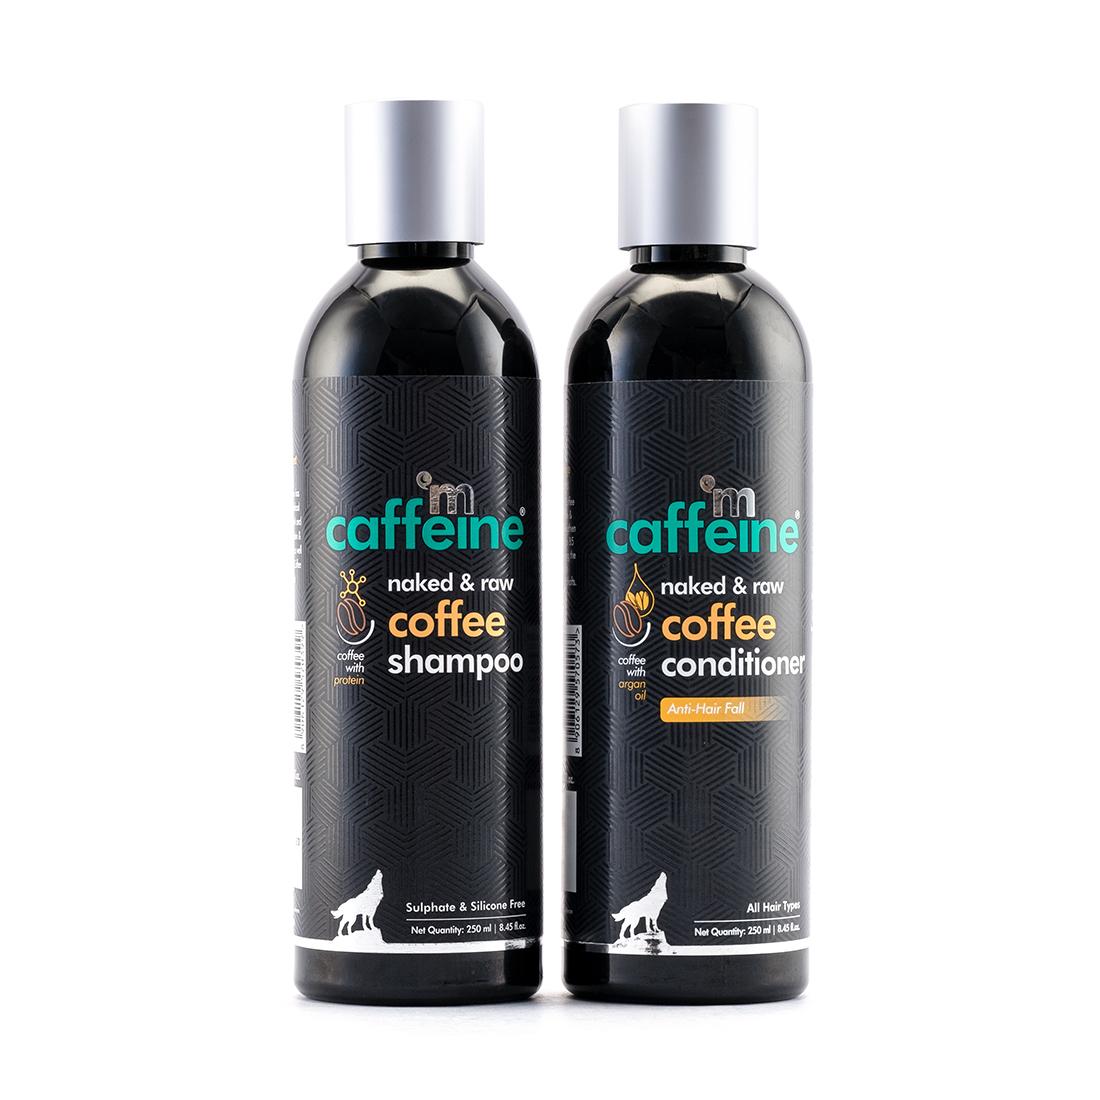 MCaffeine | mCaffeine Coffee Shampoo & Conditioner Duo - Hair Fall Control | shampoo , Conditioner